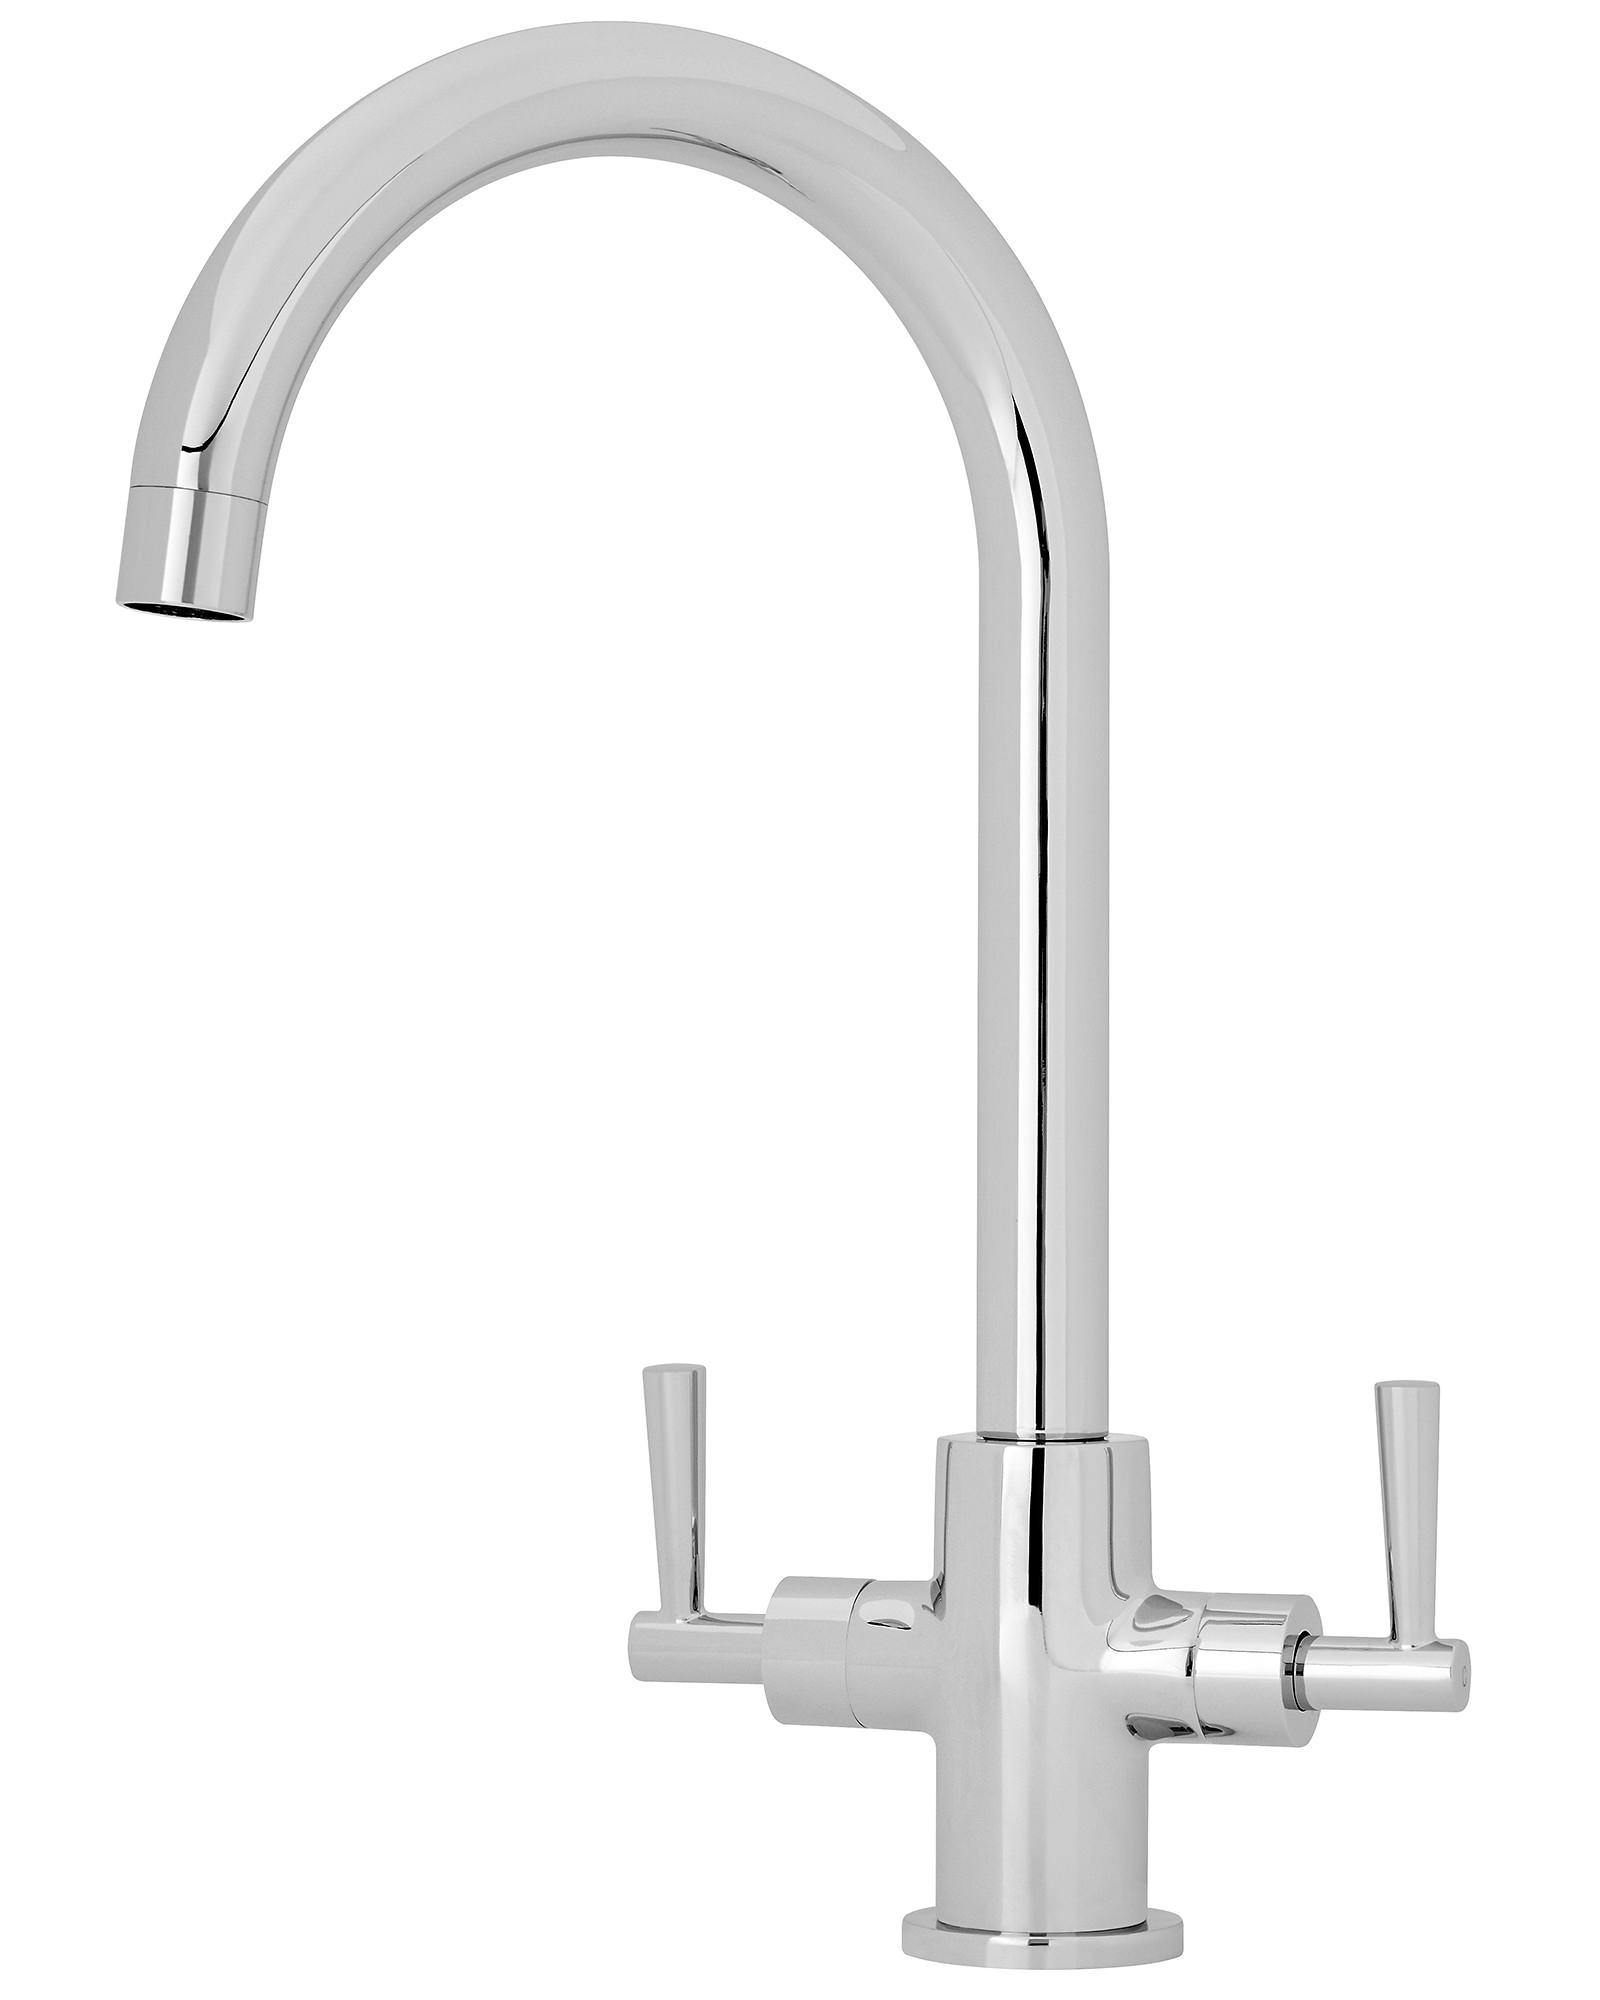 Premier 3675mm High Dual Lever Kitchen Sink Mixer Tap Kb323